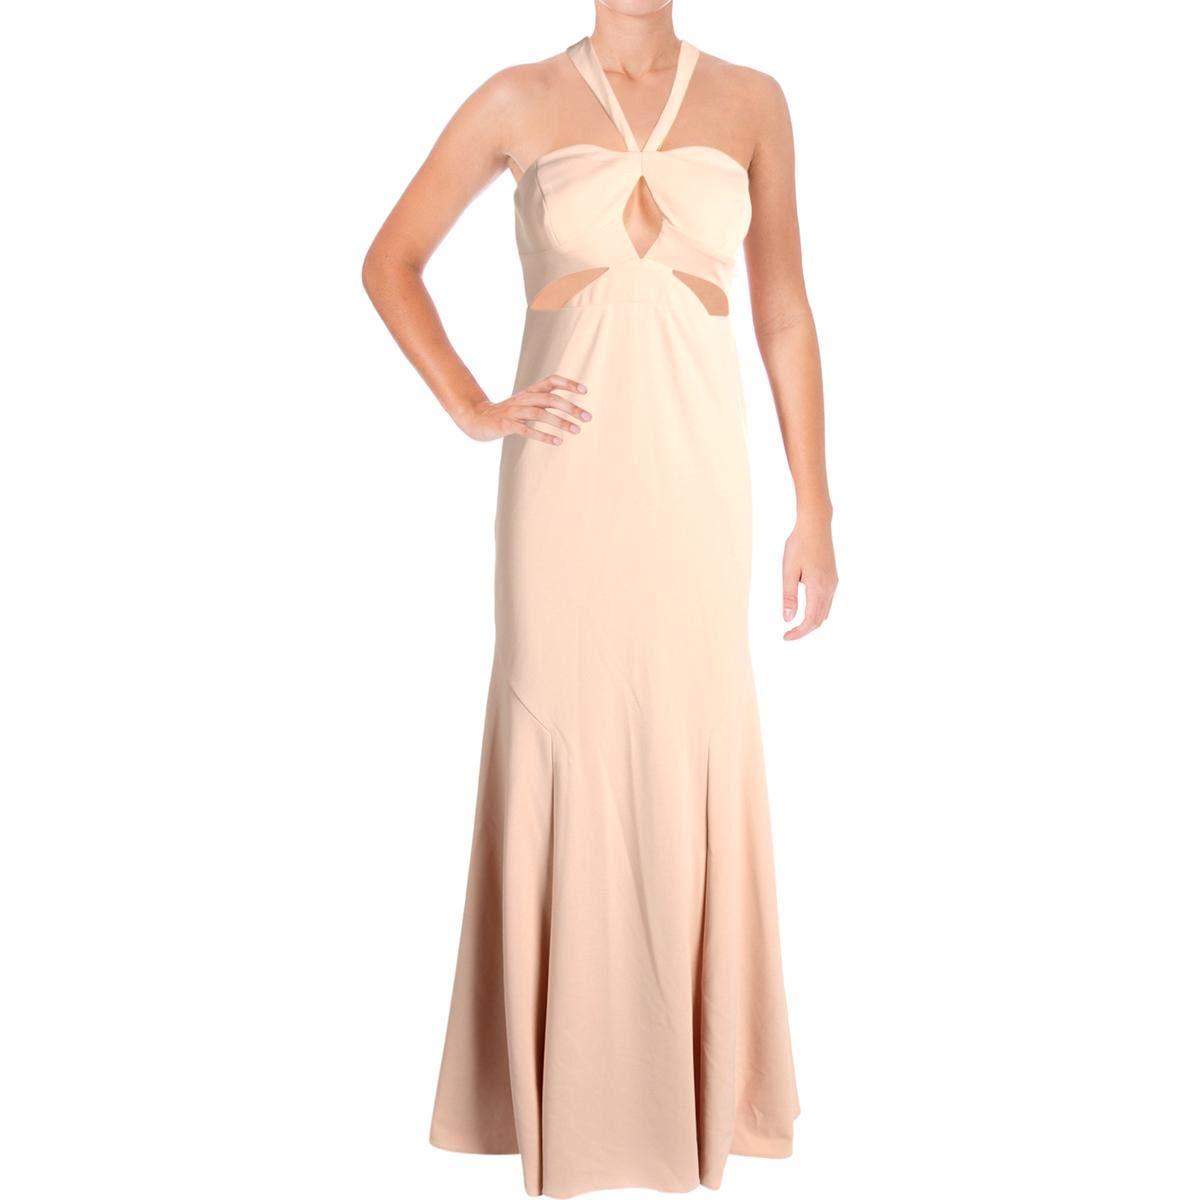 bluesh Aidan Mattox Aidan Womens CutOut Halter Formal Dress